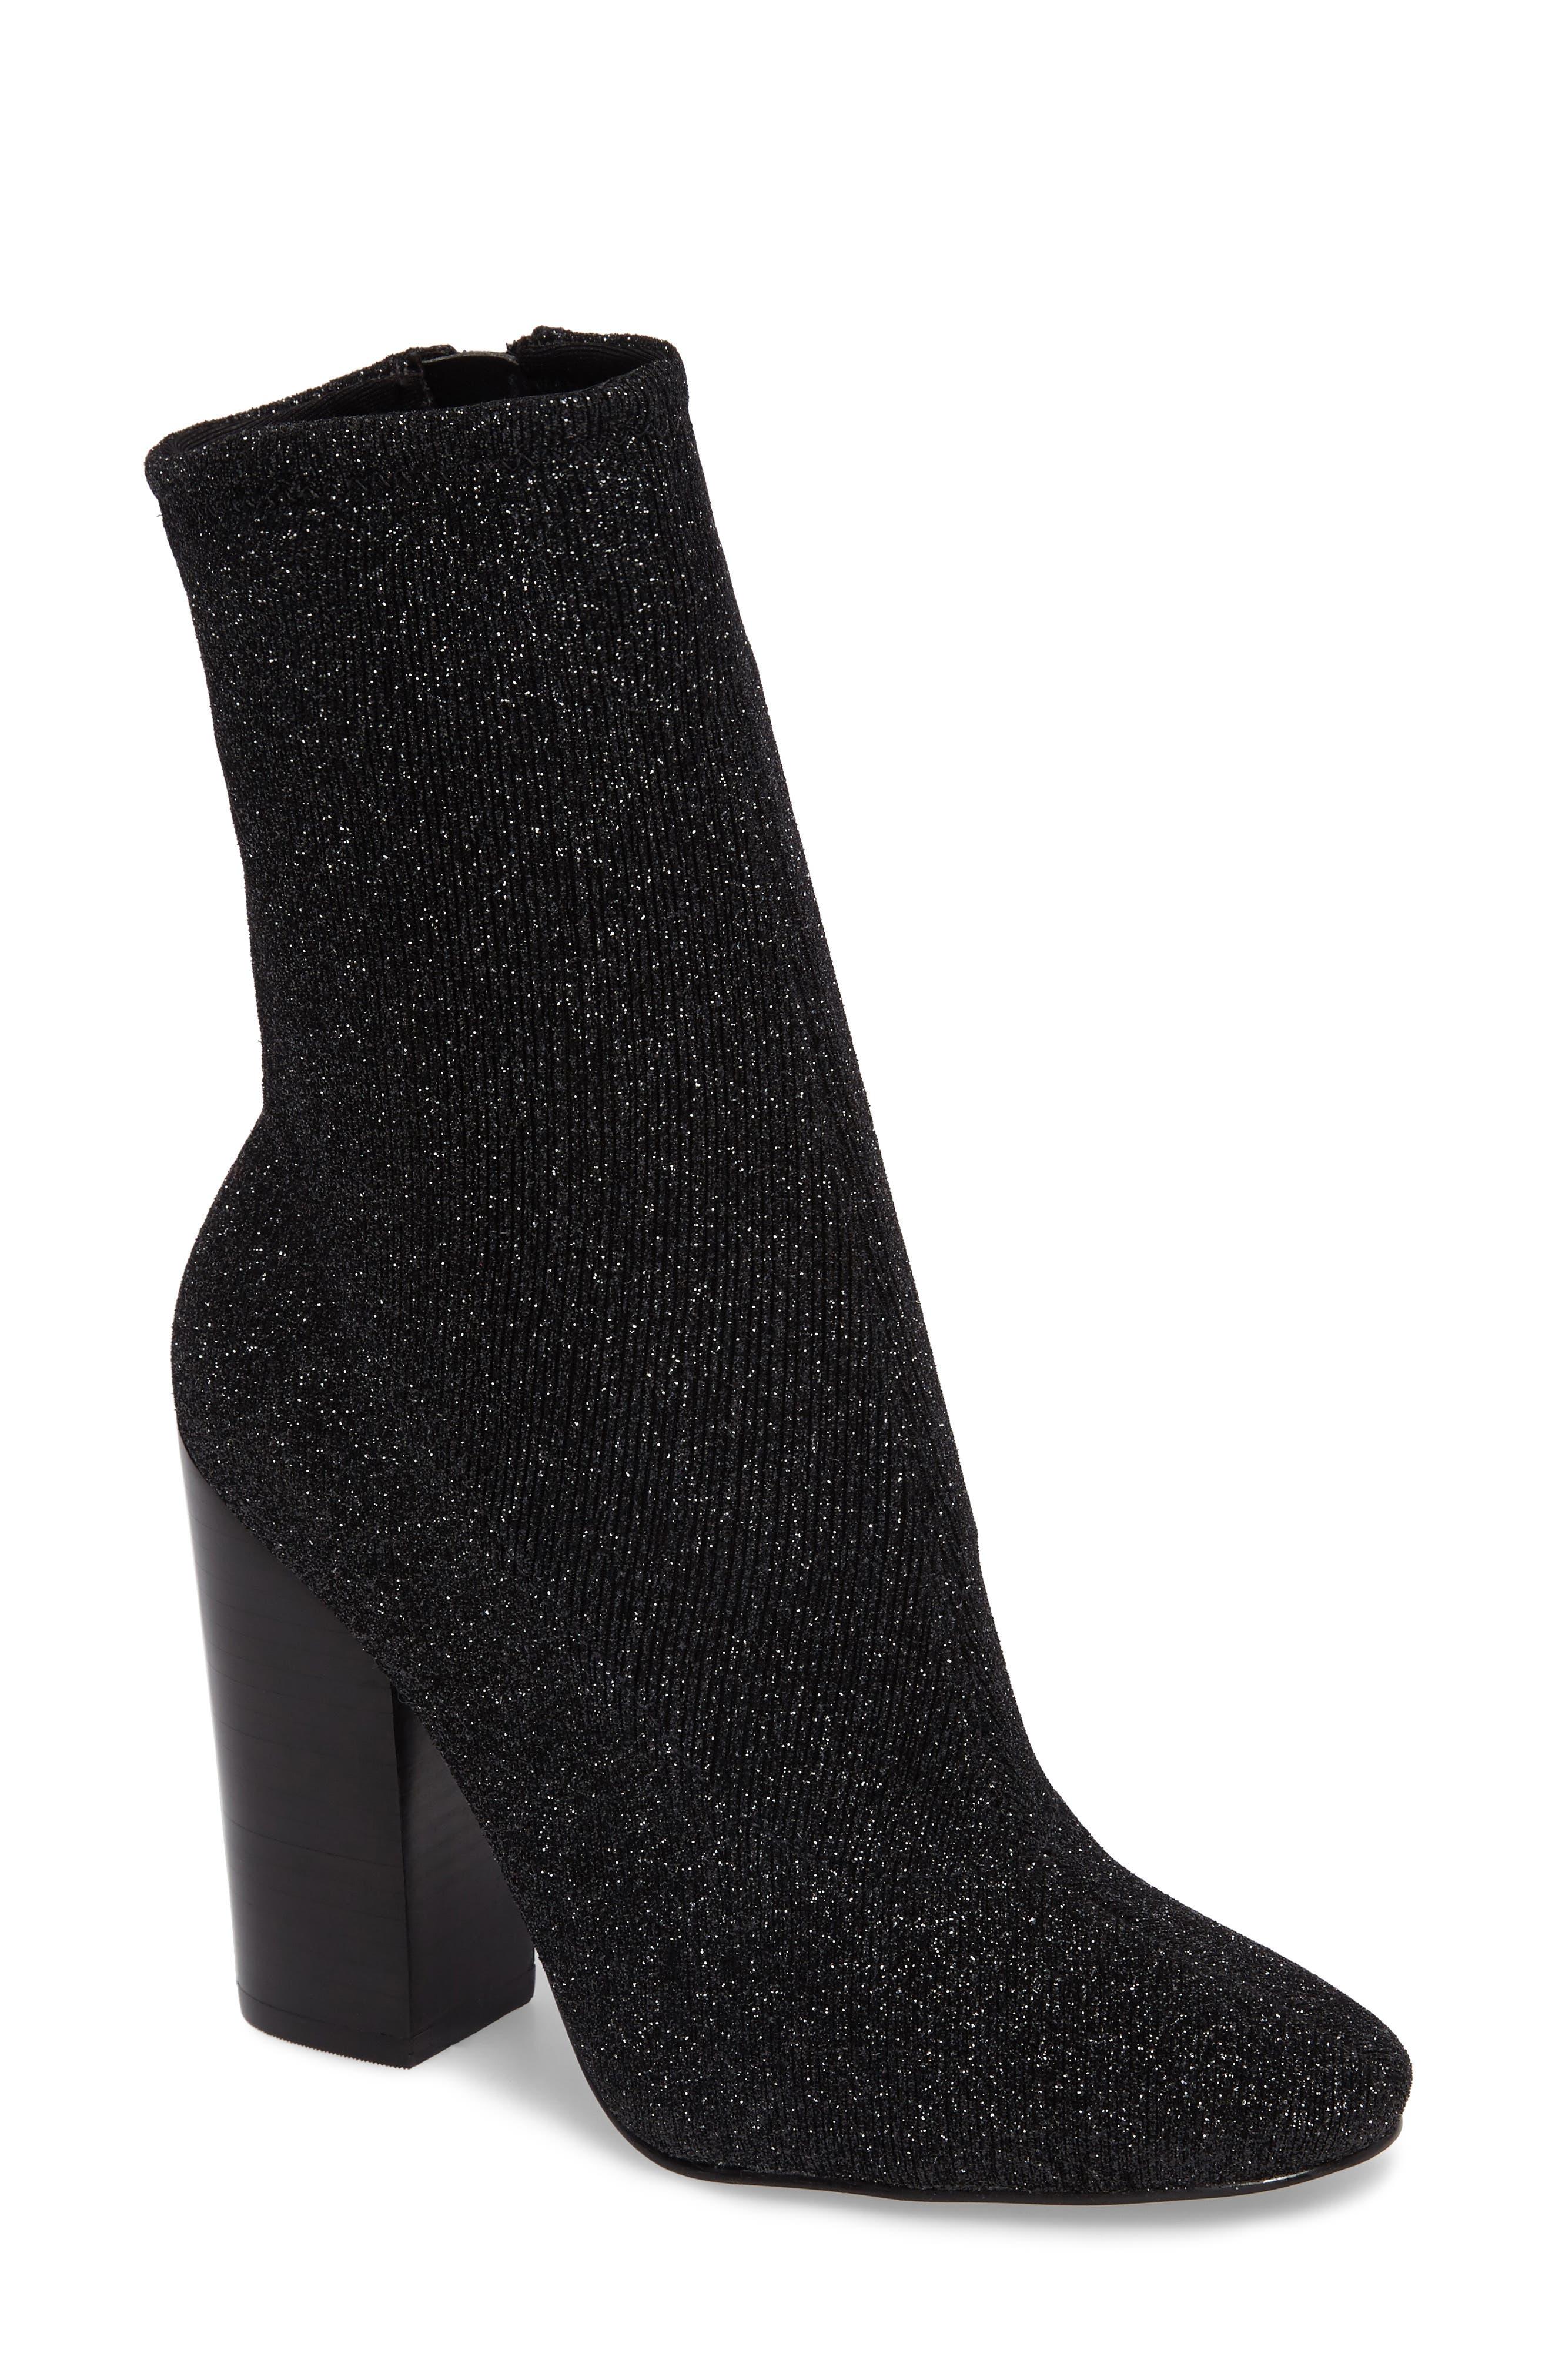 KENDALL + KYLIE Hailey Glitter Sock Bootie (Women)